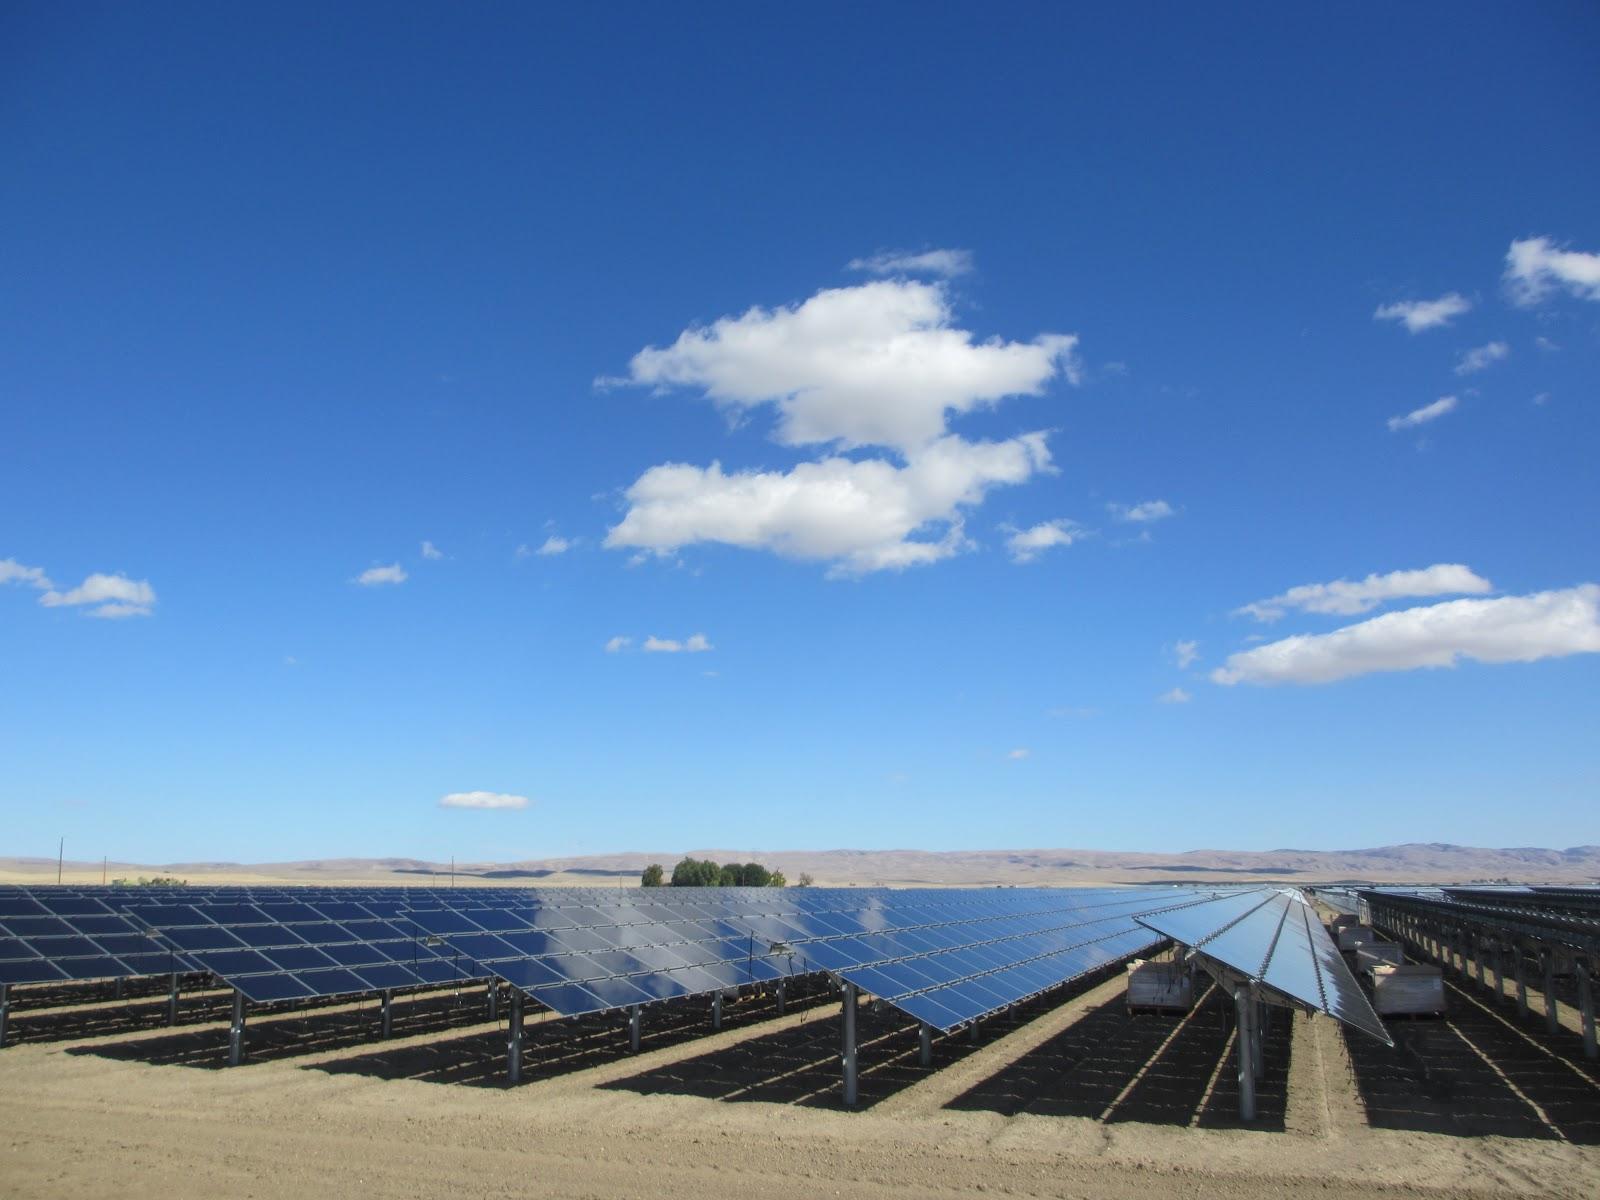 Solar panels | Verry big wallpapers